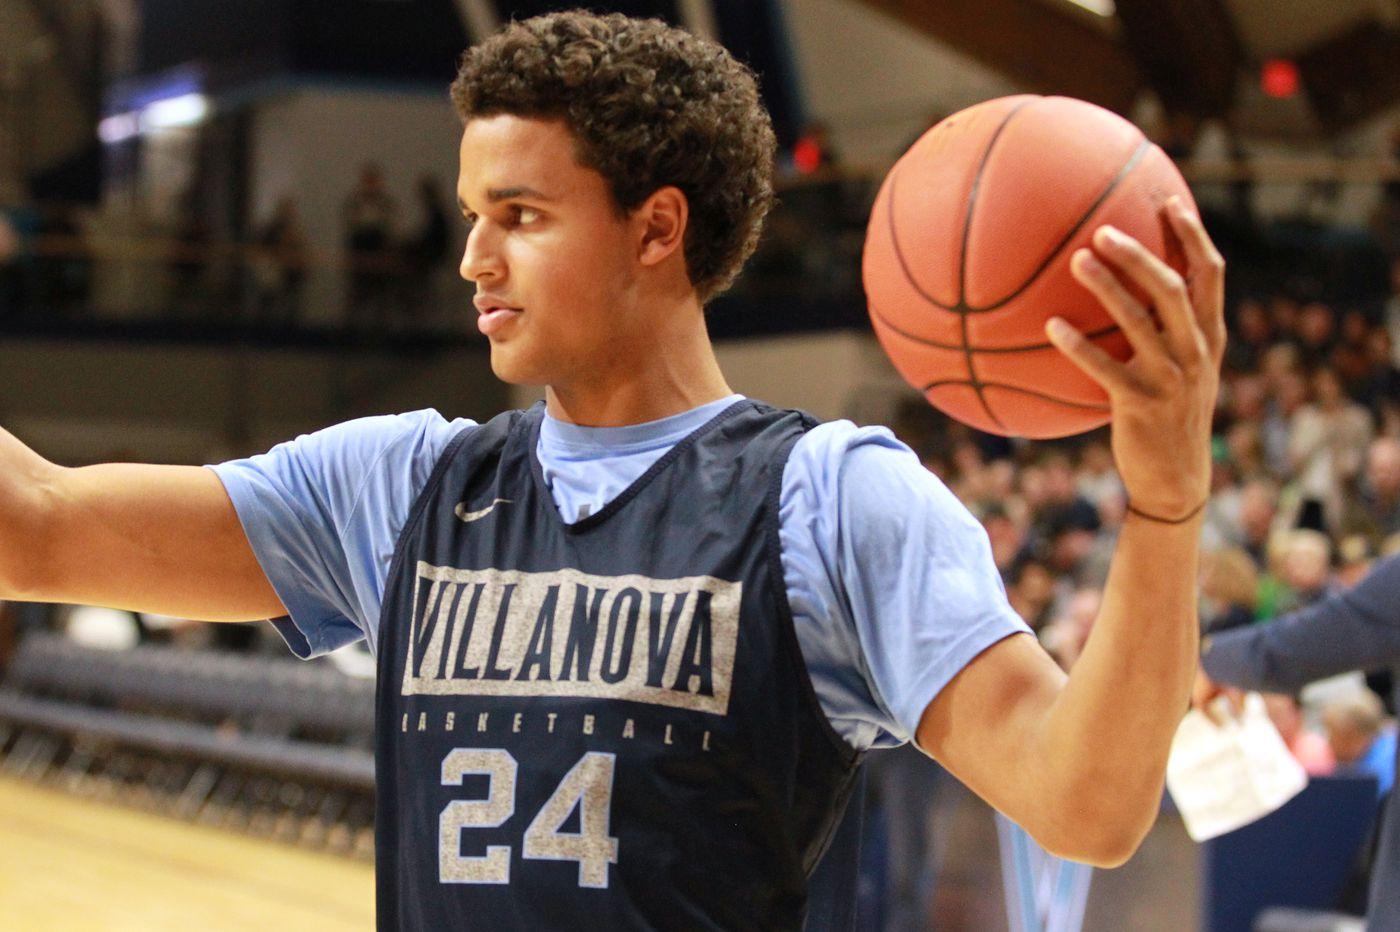 Villanova's Jeremiah Robinson-Earl filling some big shoes | College basketball preview